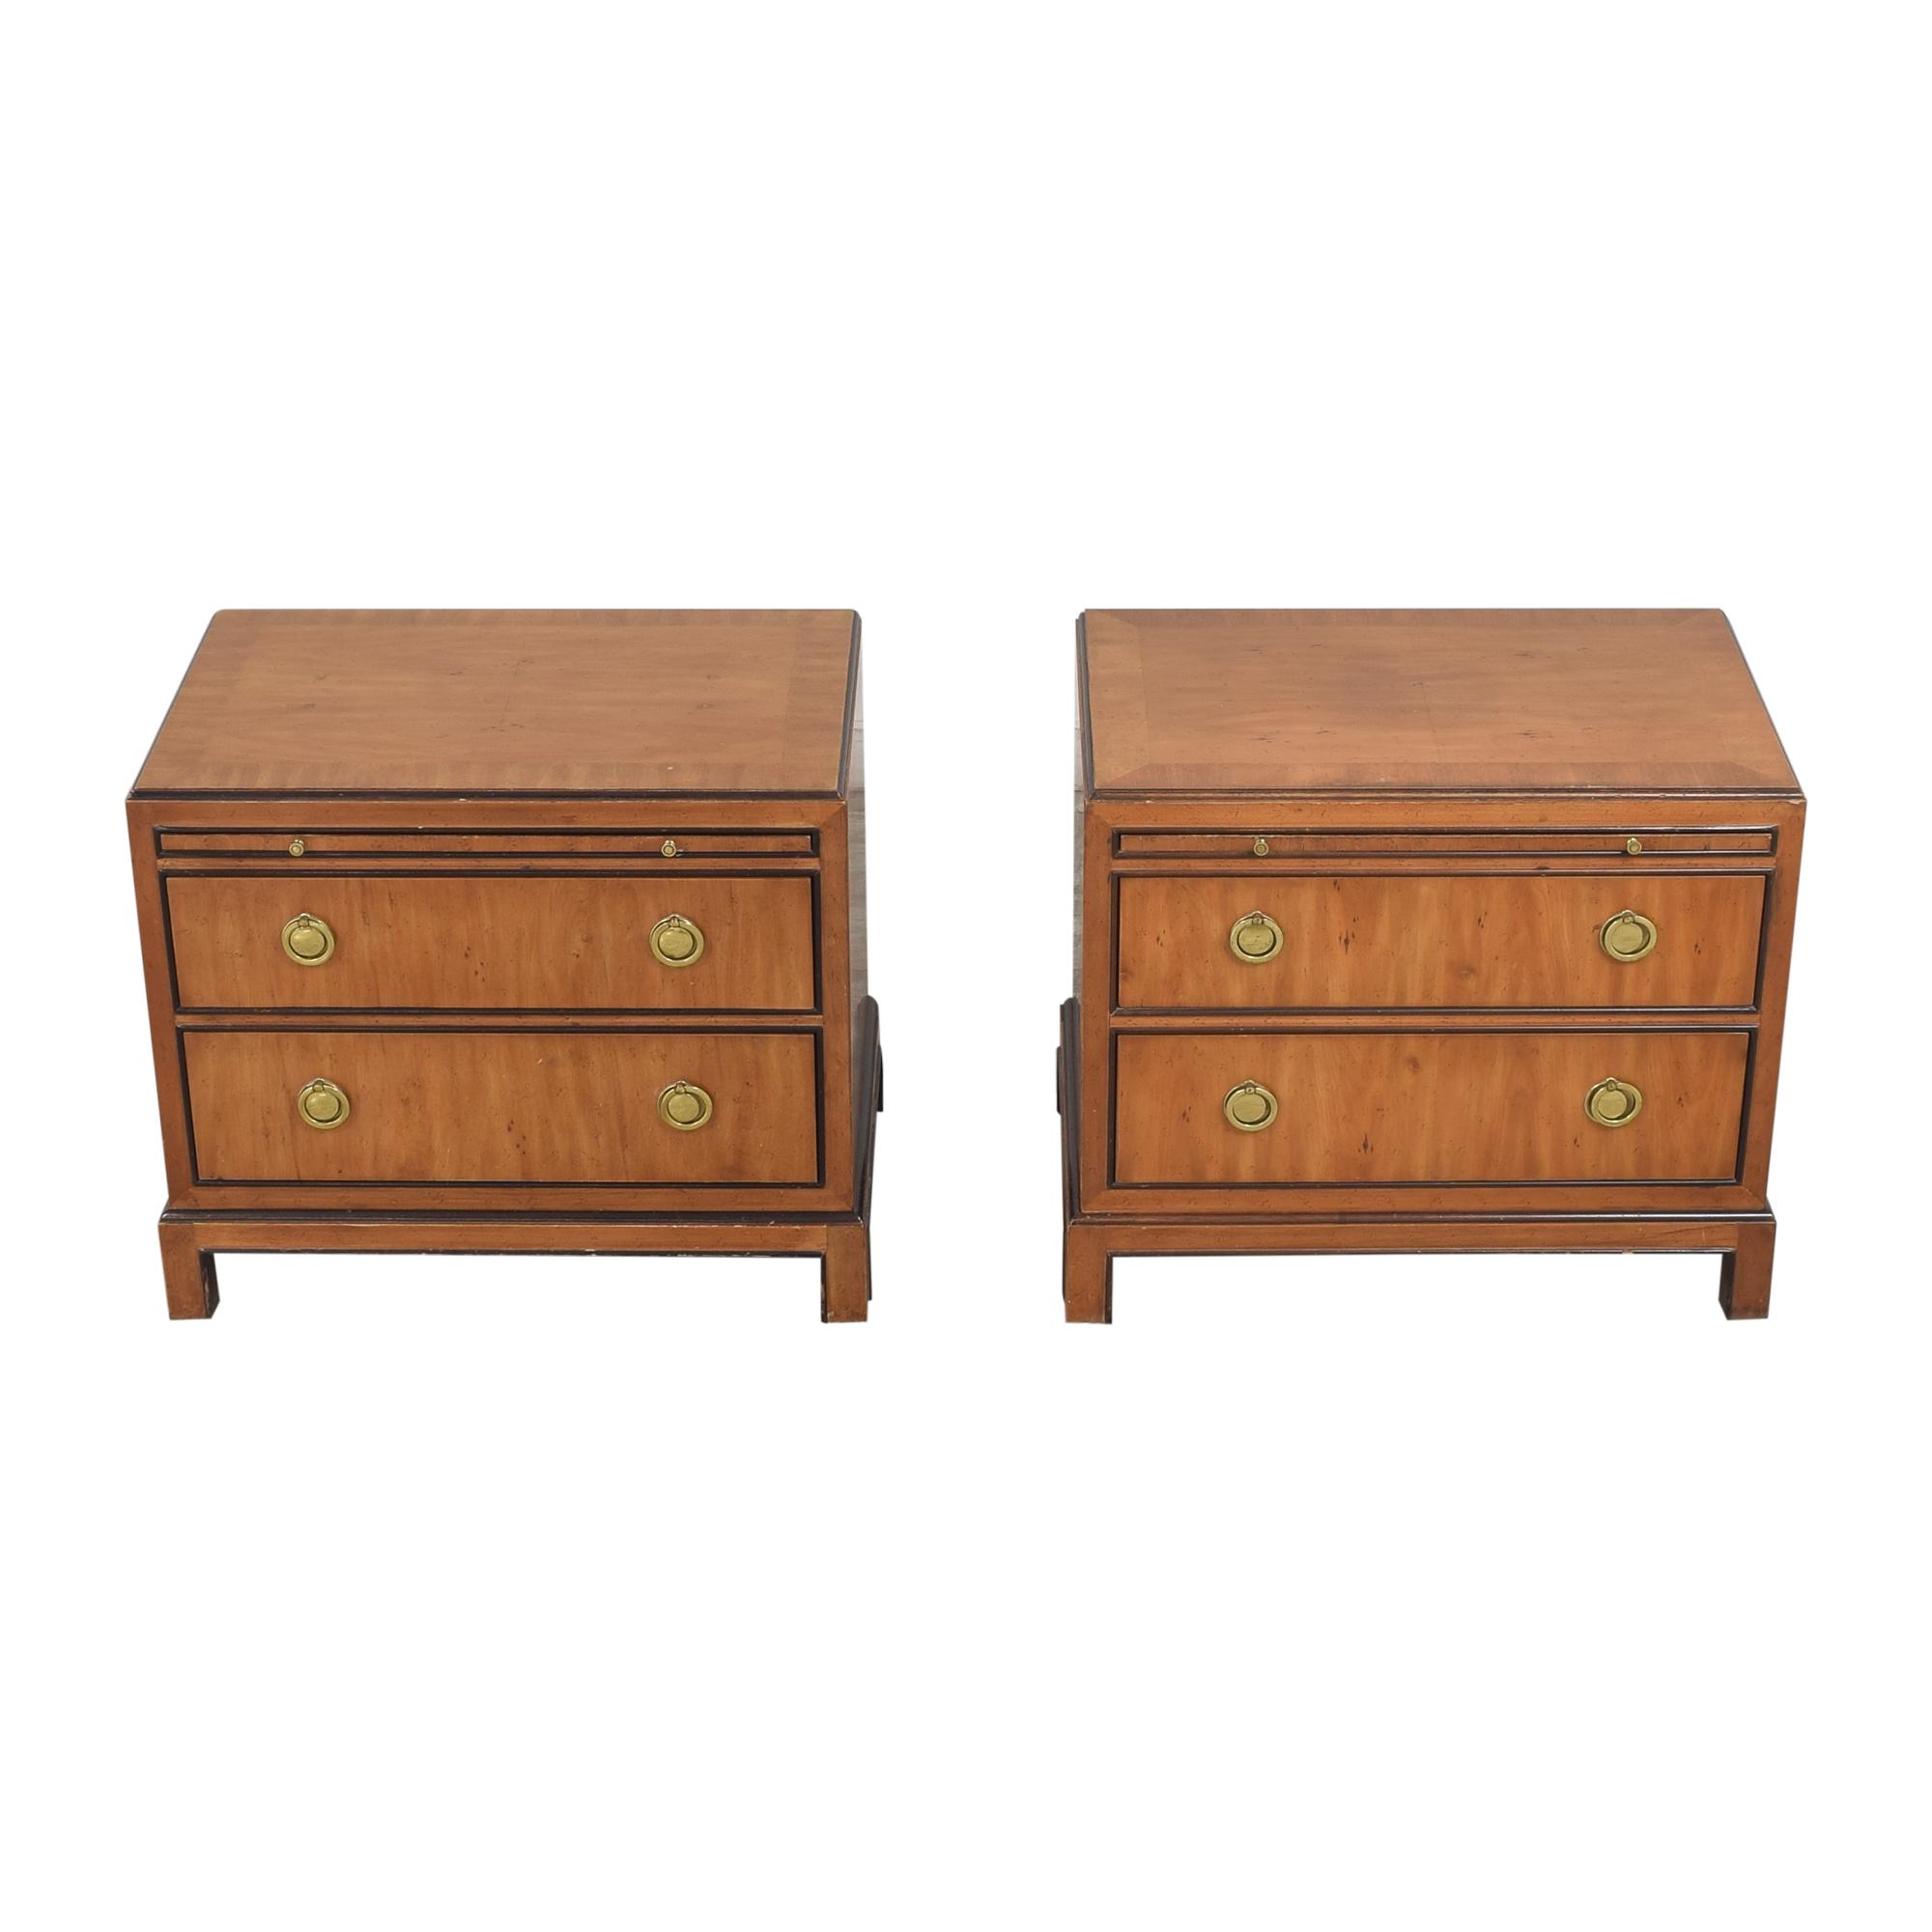 Drexel Heritage Drexel Heritage Avenues Collection Nightstands  price